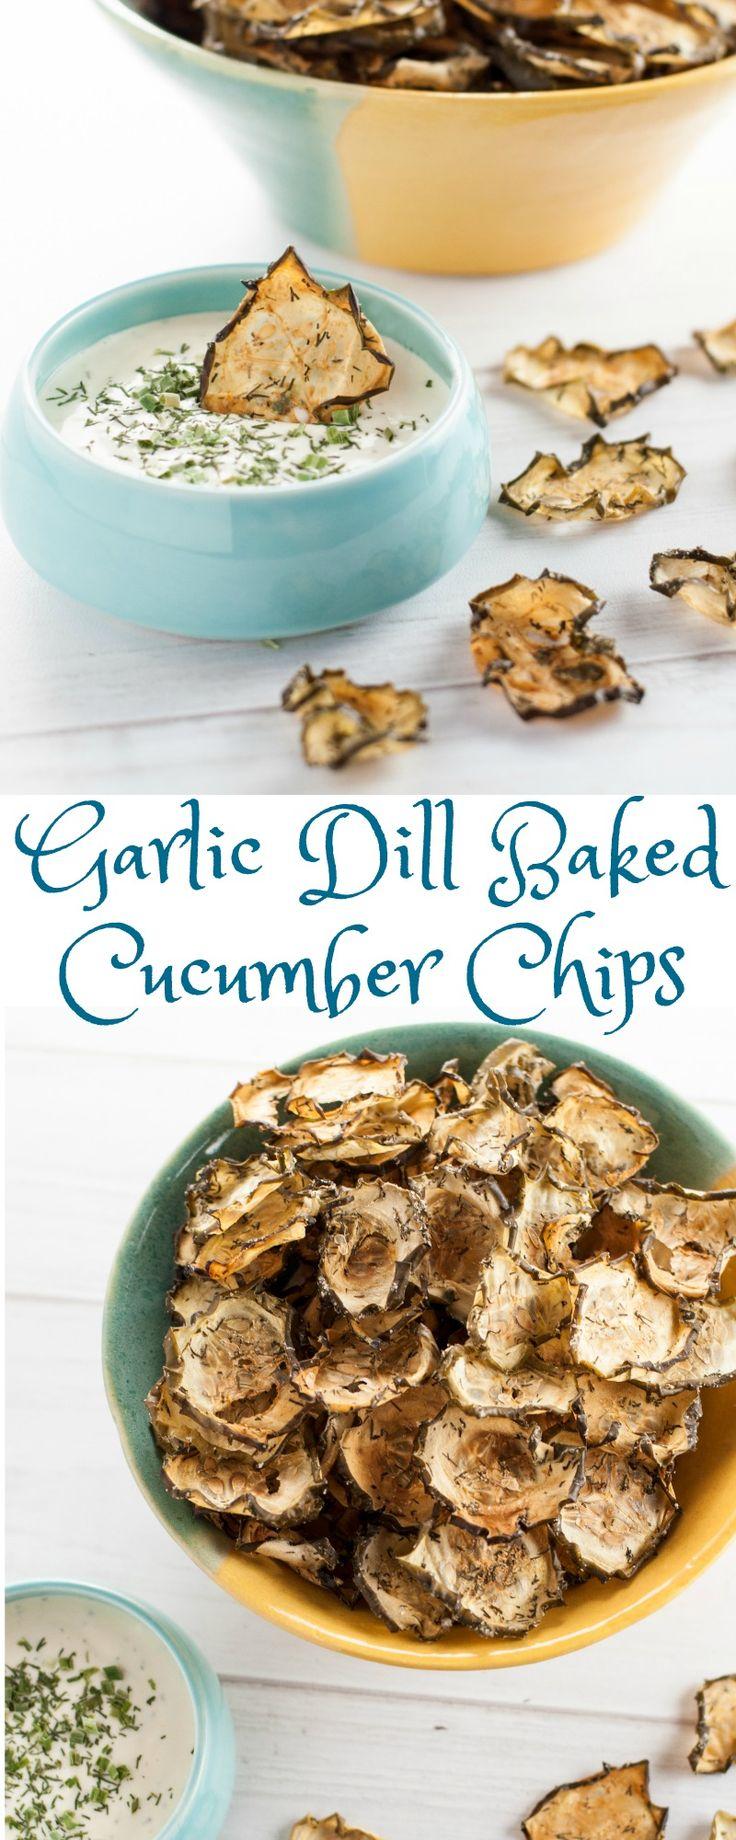 Garlic Dill Baked Cucumber Chips - cucumbers, dried dill, onion powder, garlic powder, ACV, sea salt